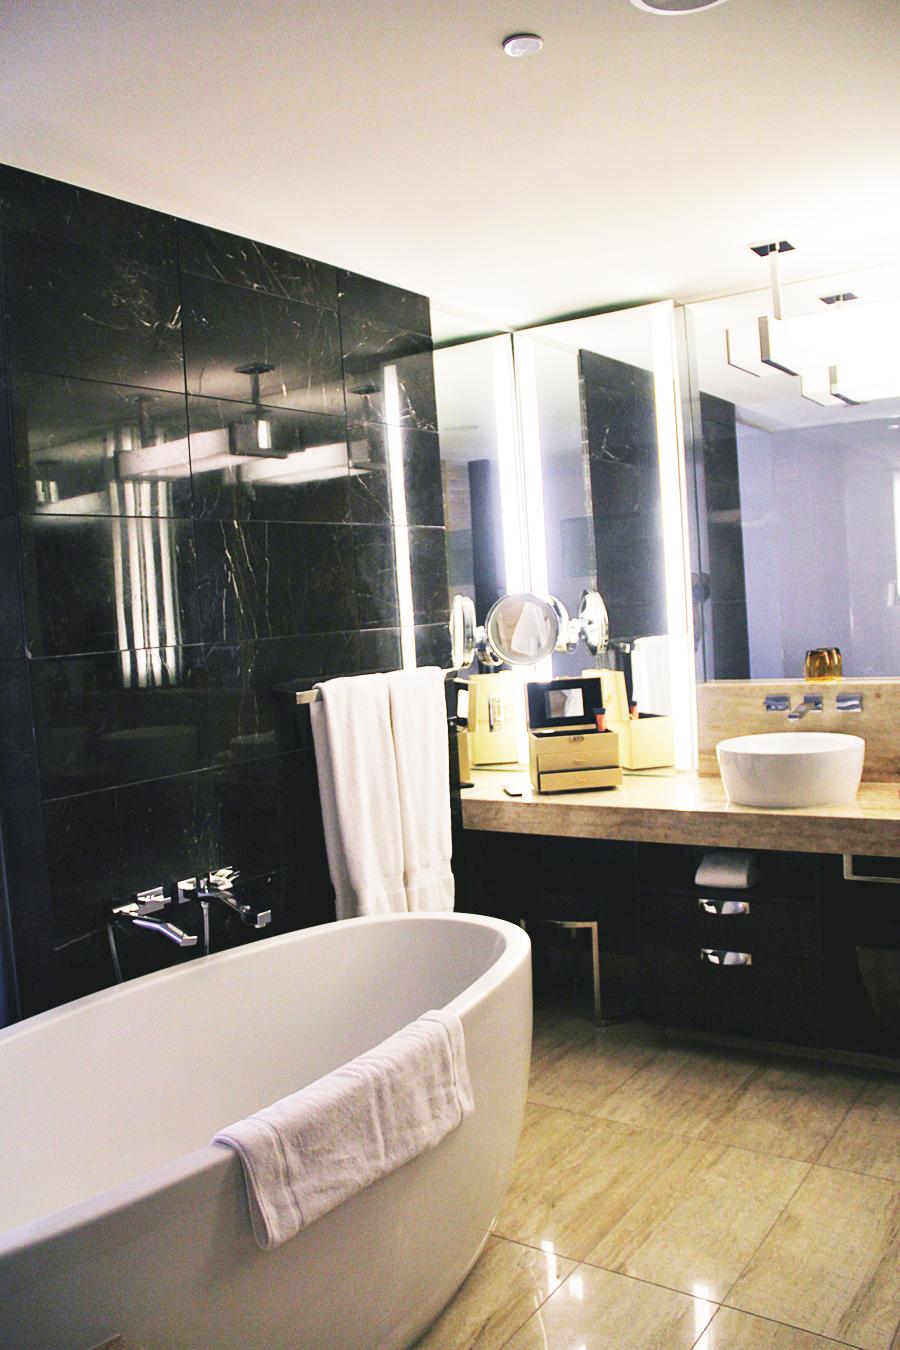 bathtub bathroom hotel las vegas 5 star